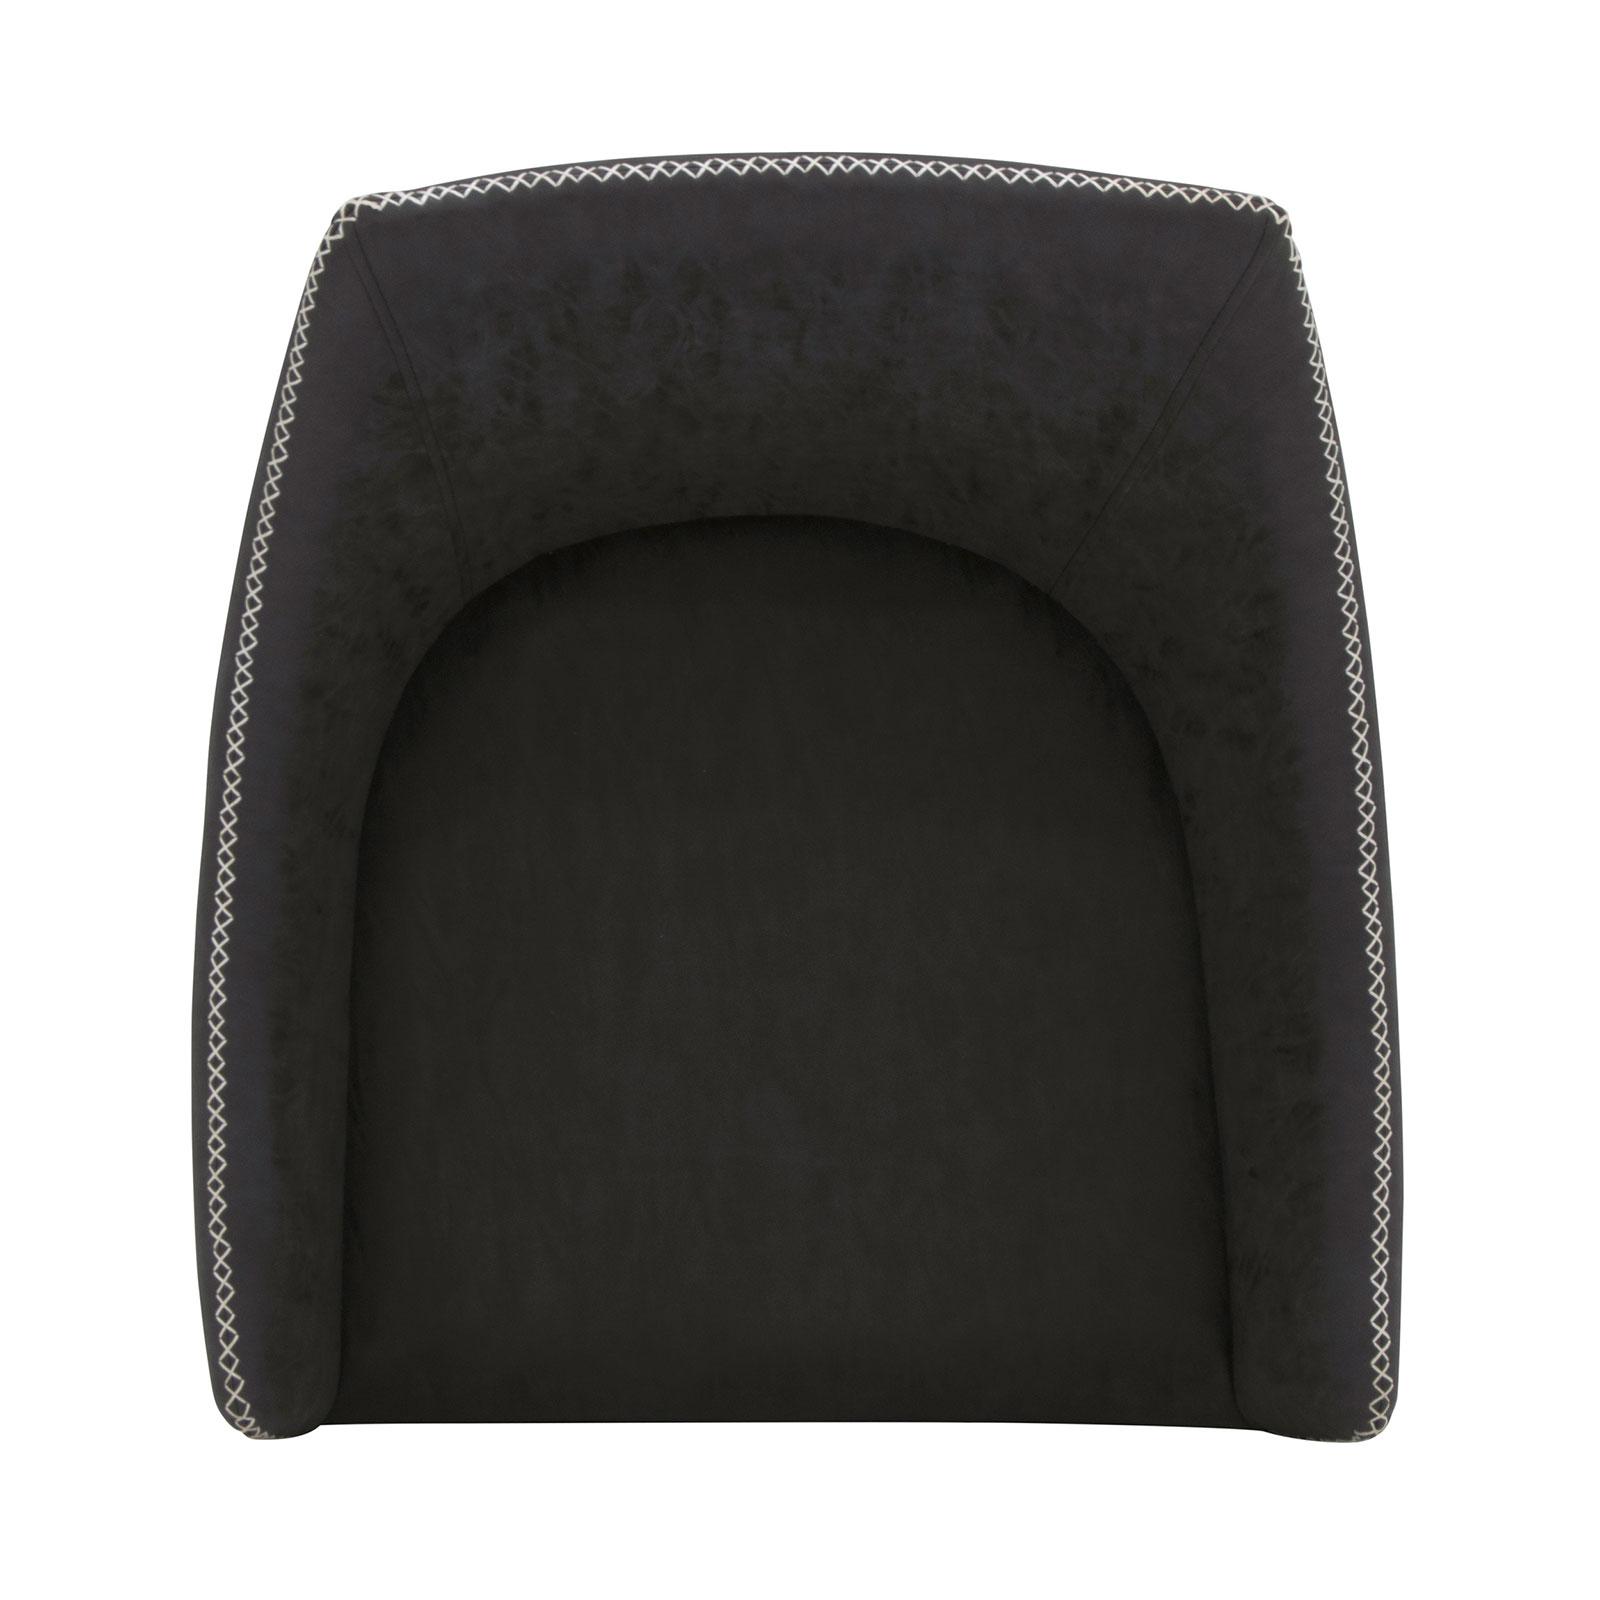 52004-Sydney-Office-Chair-top